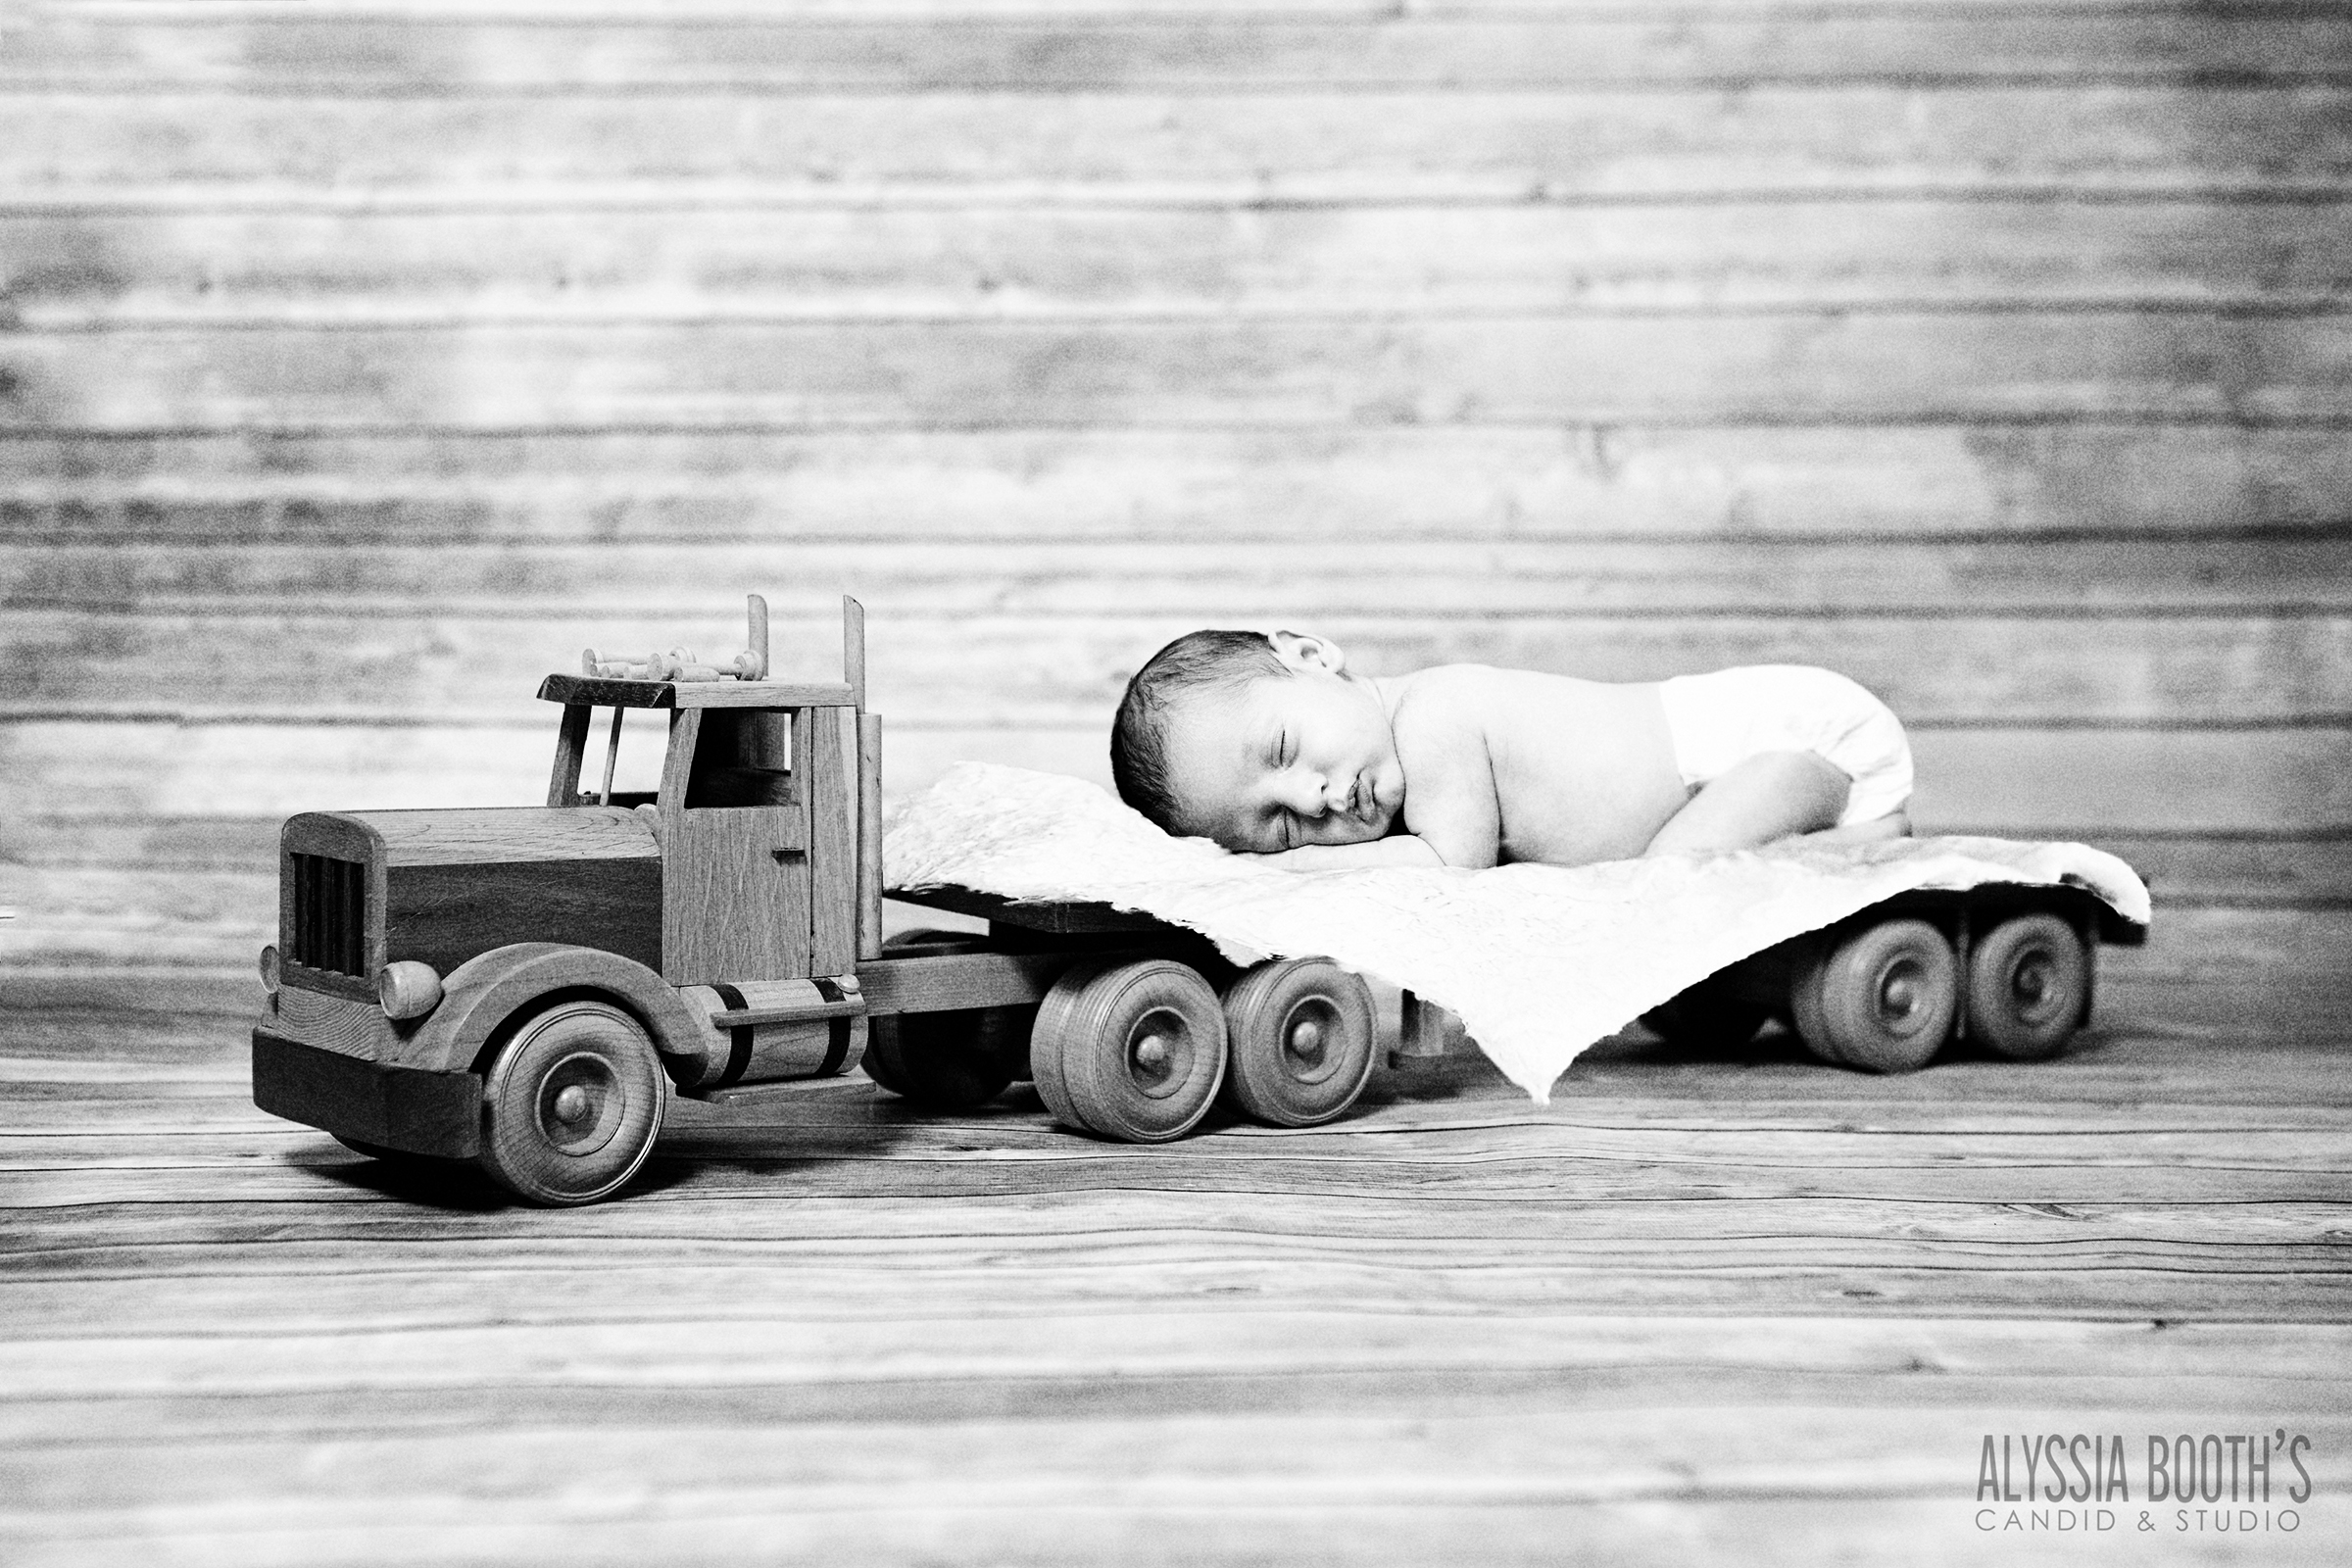 Baby Truck | Toy Semi | Newborn Shoot with Trucks | Baby Boy | Alyssia Booth's Candid & Studio | Lansing Michigan | Studio Shoot